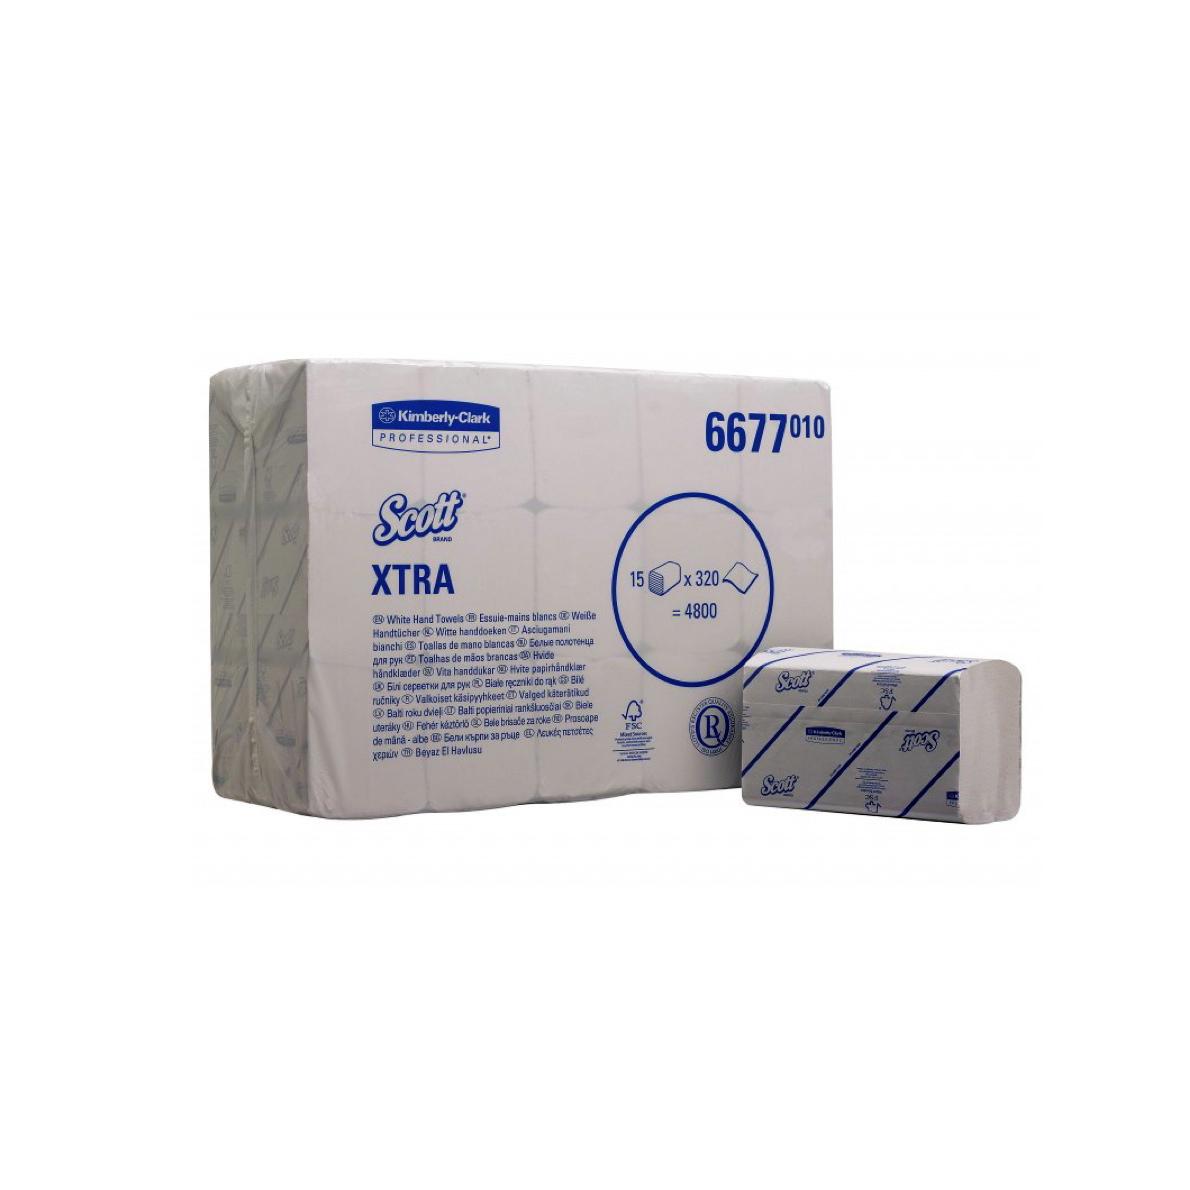 Papirnate brisače Scott Xtra tip V 4800 Kimberly Clark